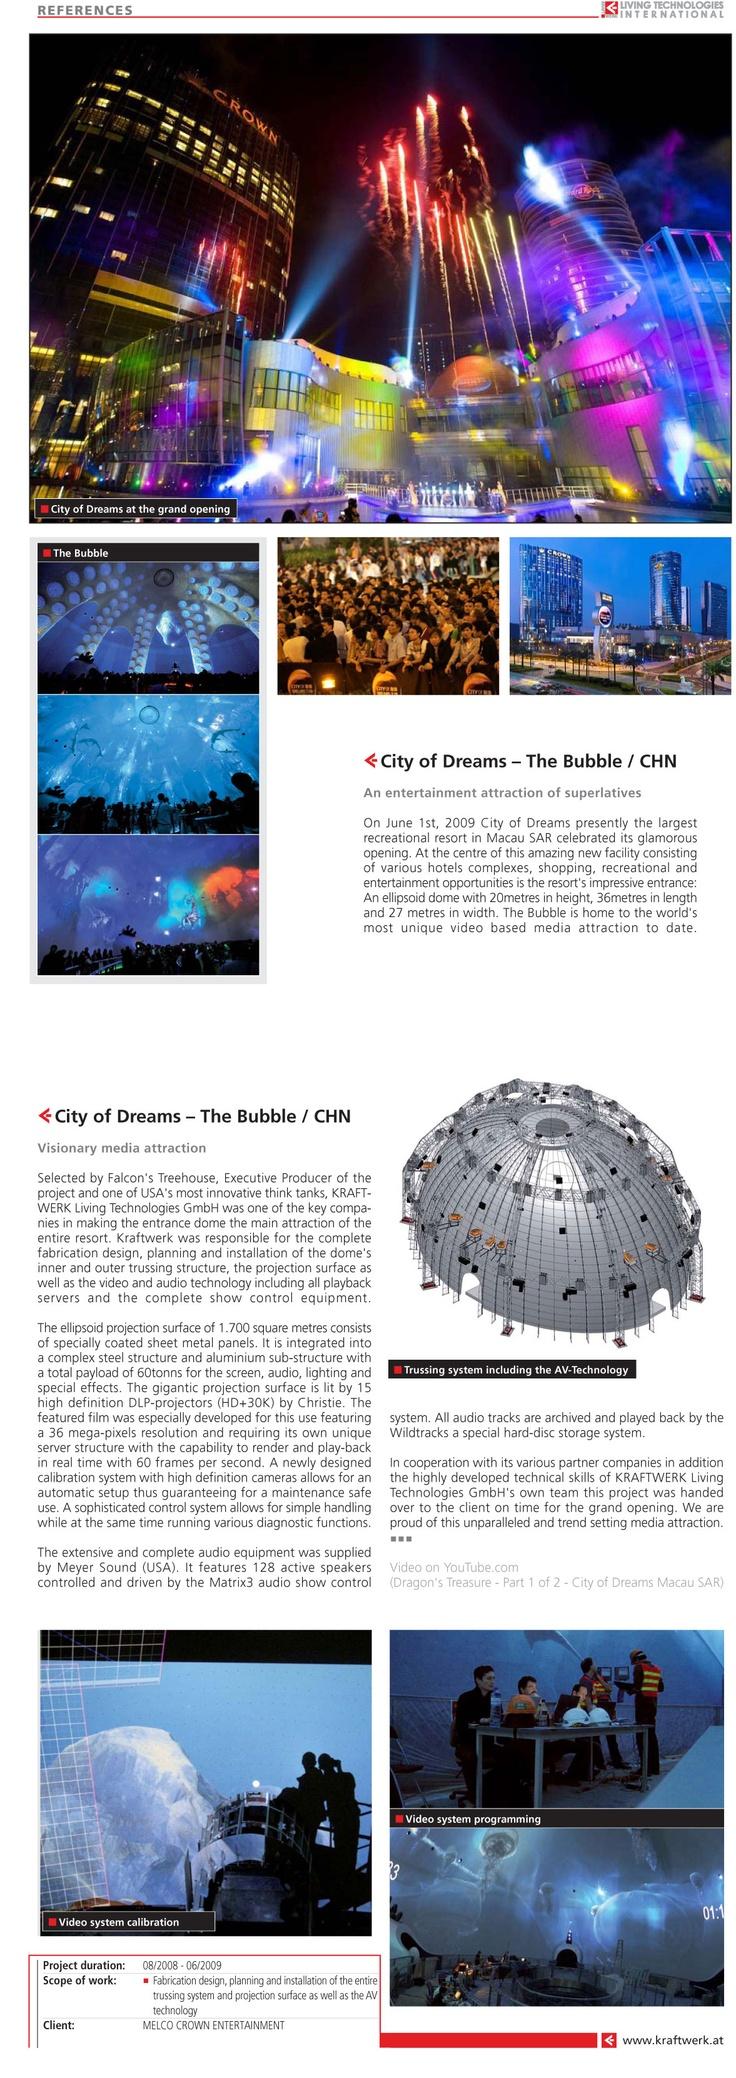 The Bubble, City of Dreams, Macau